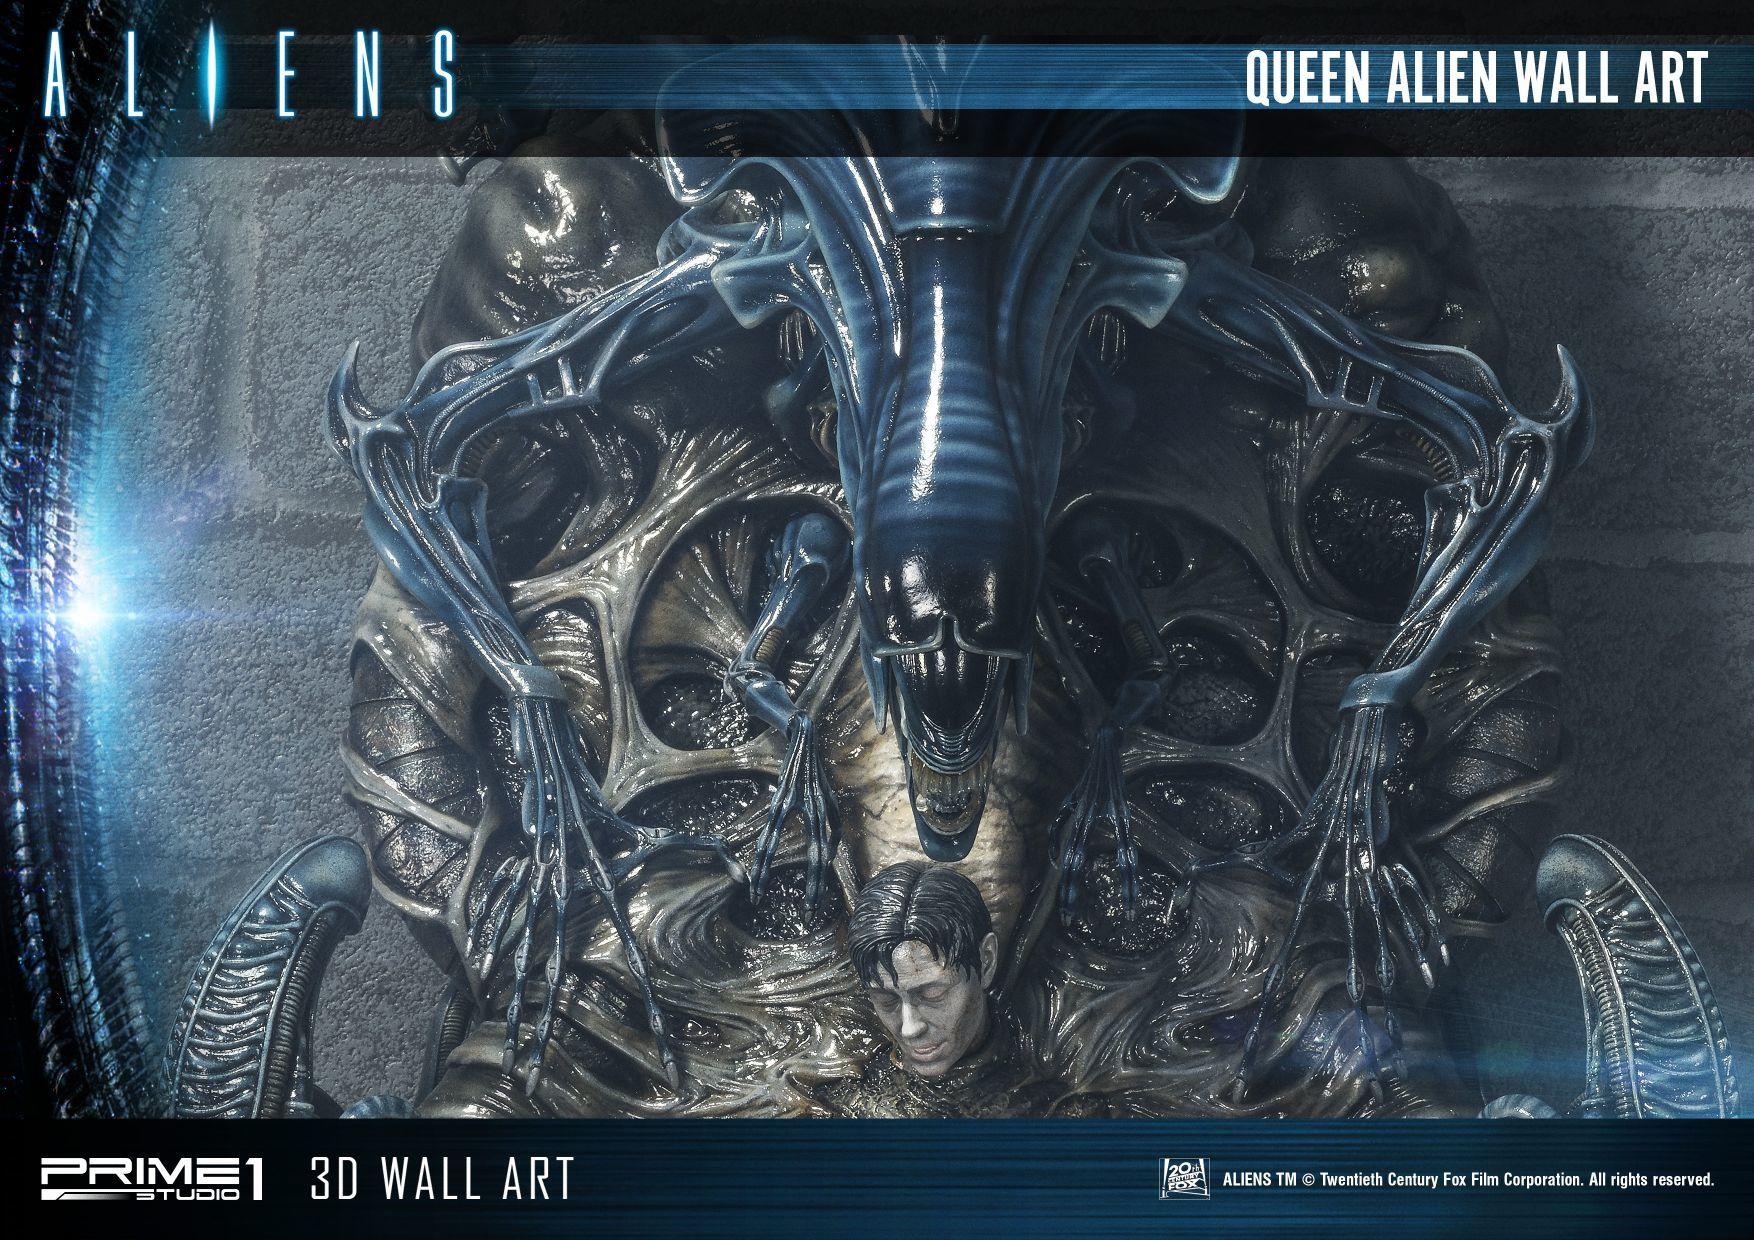 Aliens TM &(C)Twentieth Century Fox Film Corporation. All Rights Reserved.